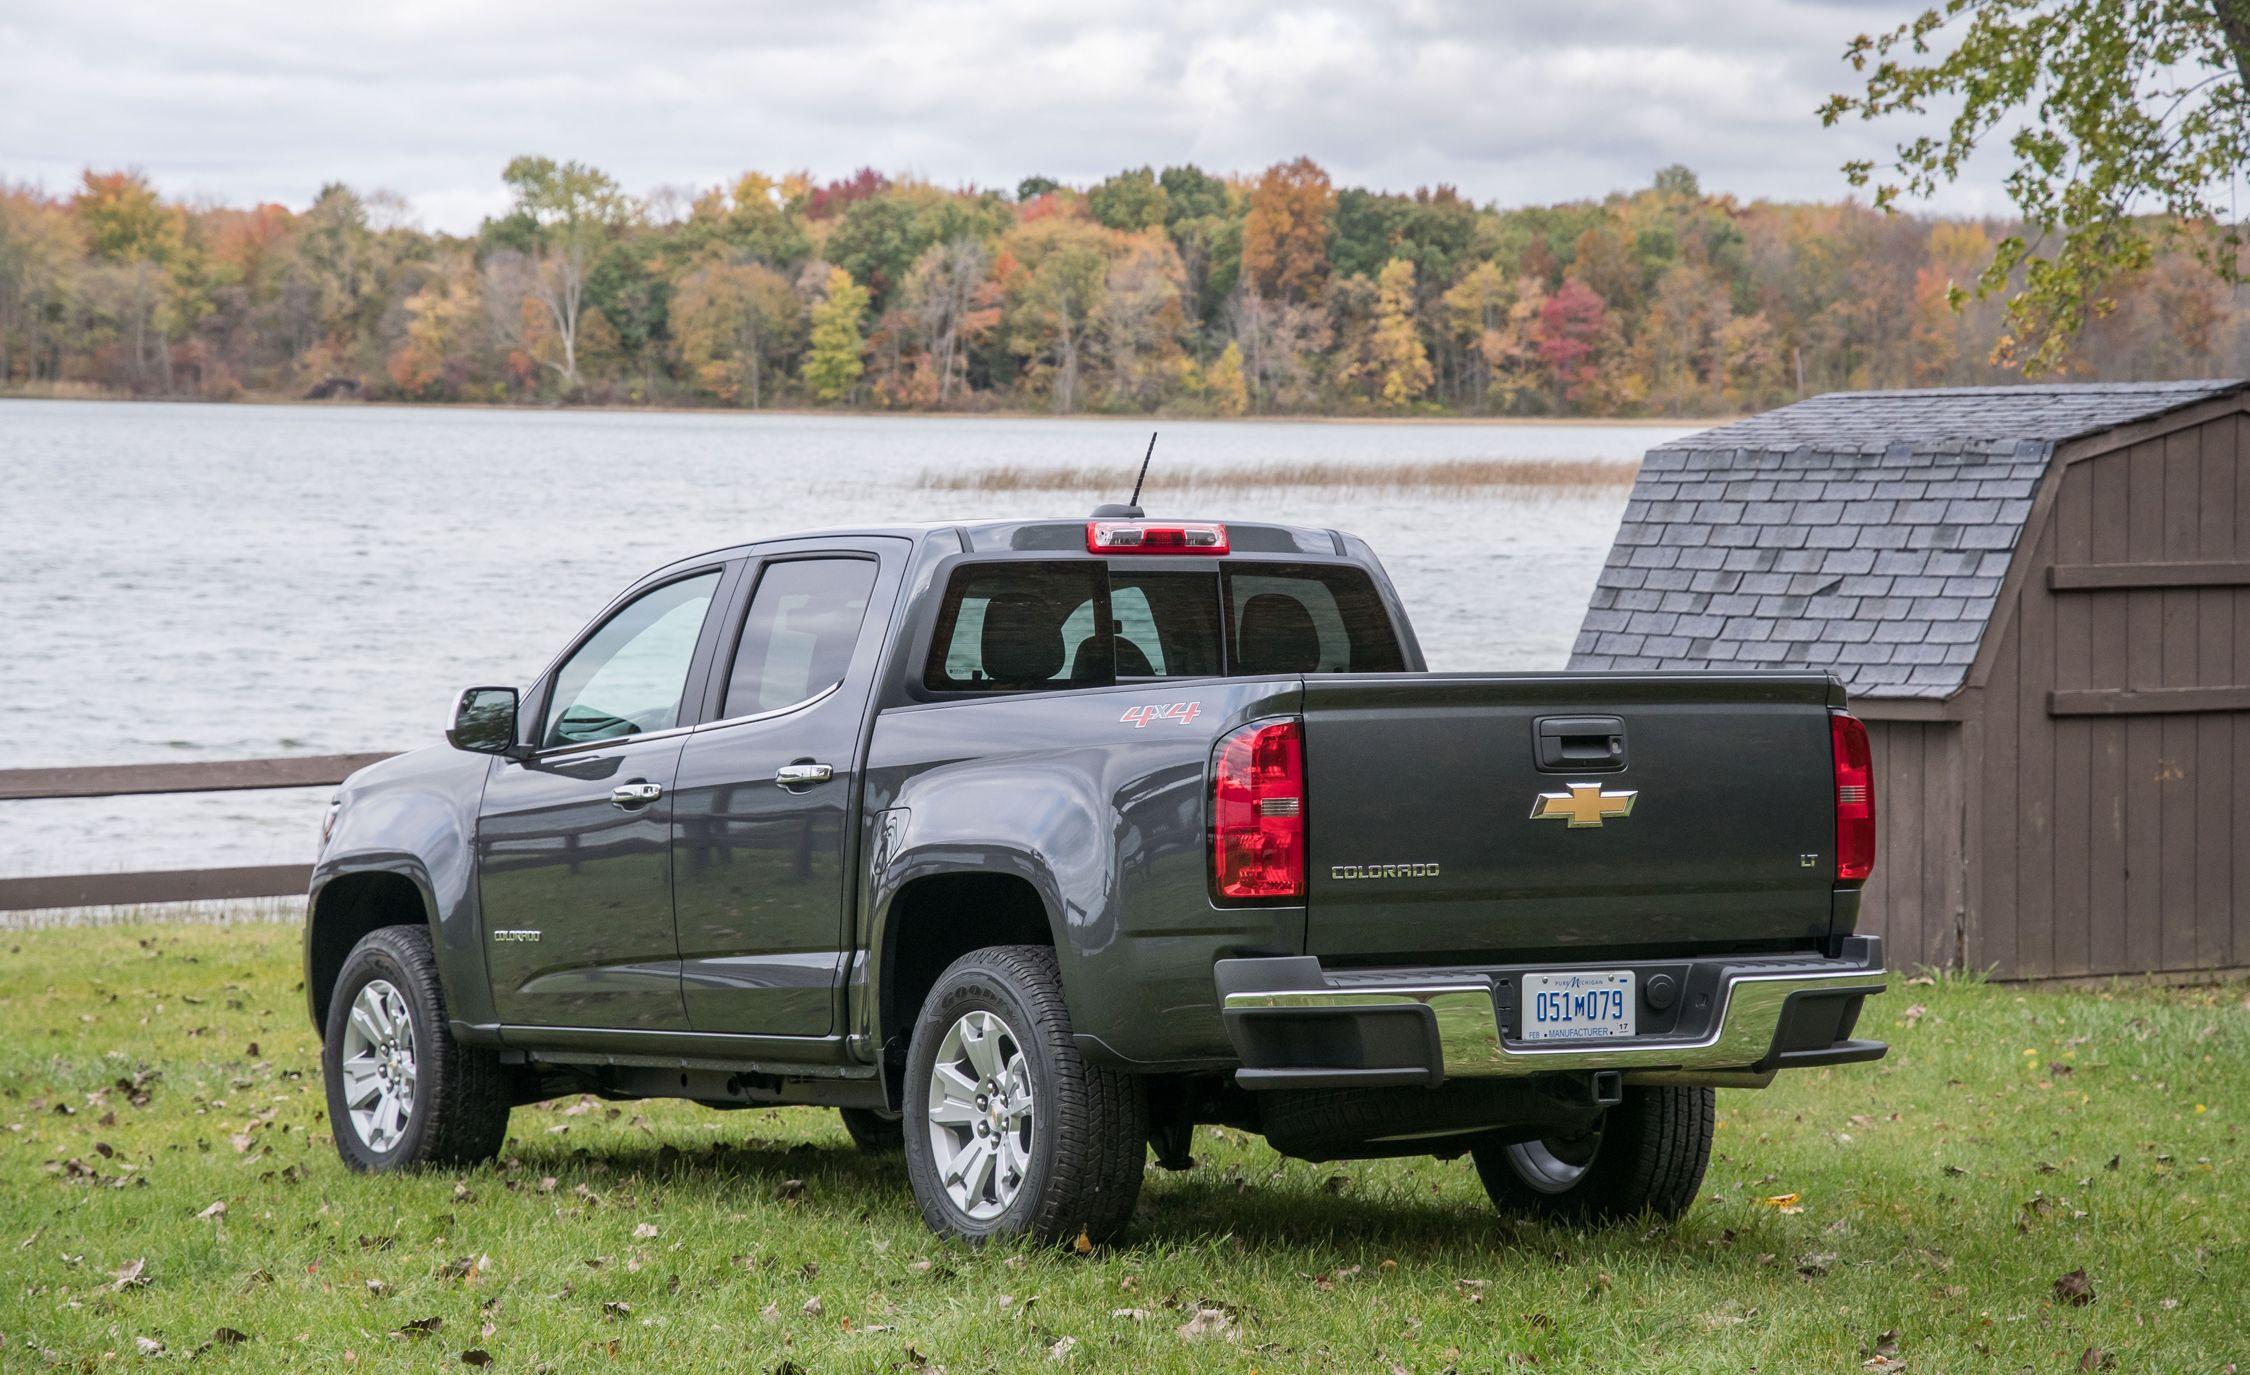 2017 Chevrolet Colorado Fuel Economy Review Car And Driver 3 5l Engine Parts Diagram